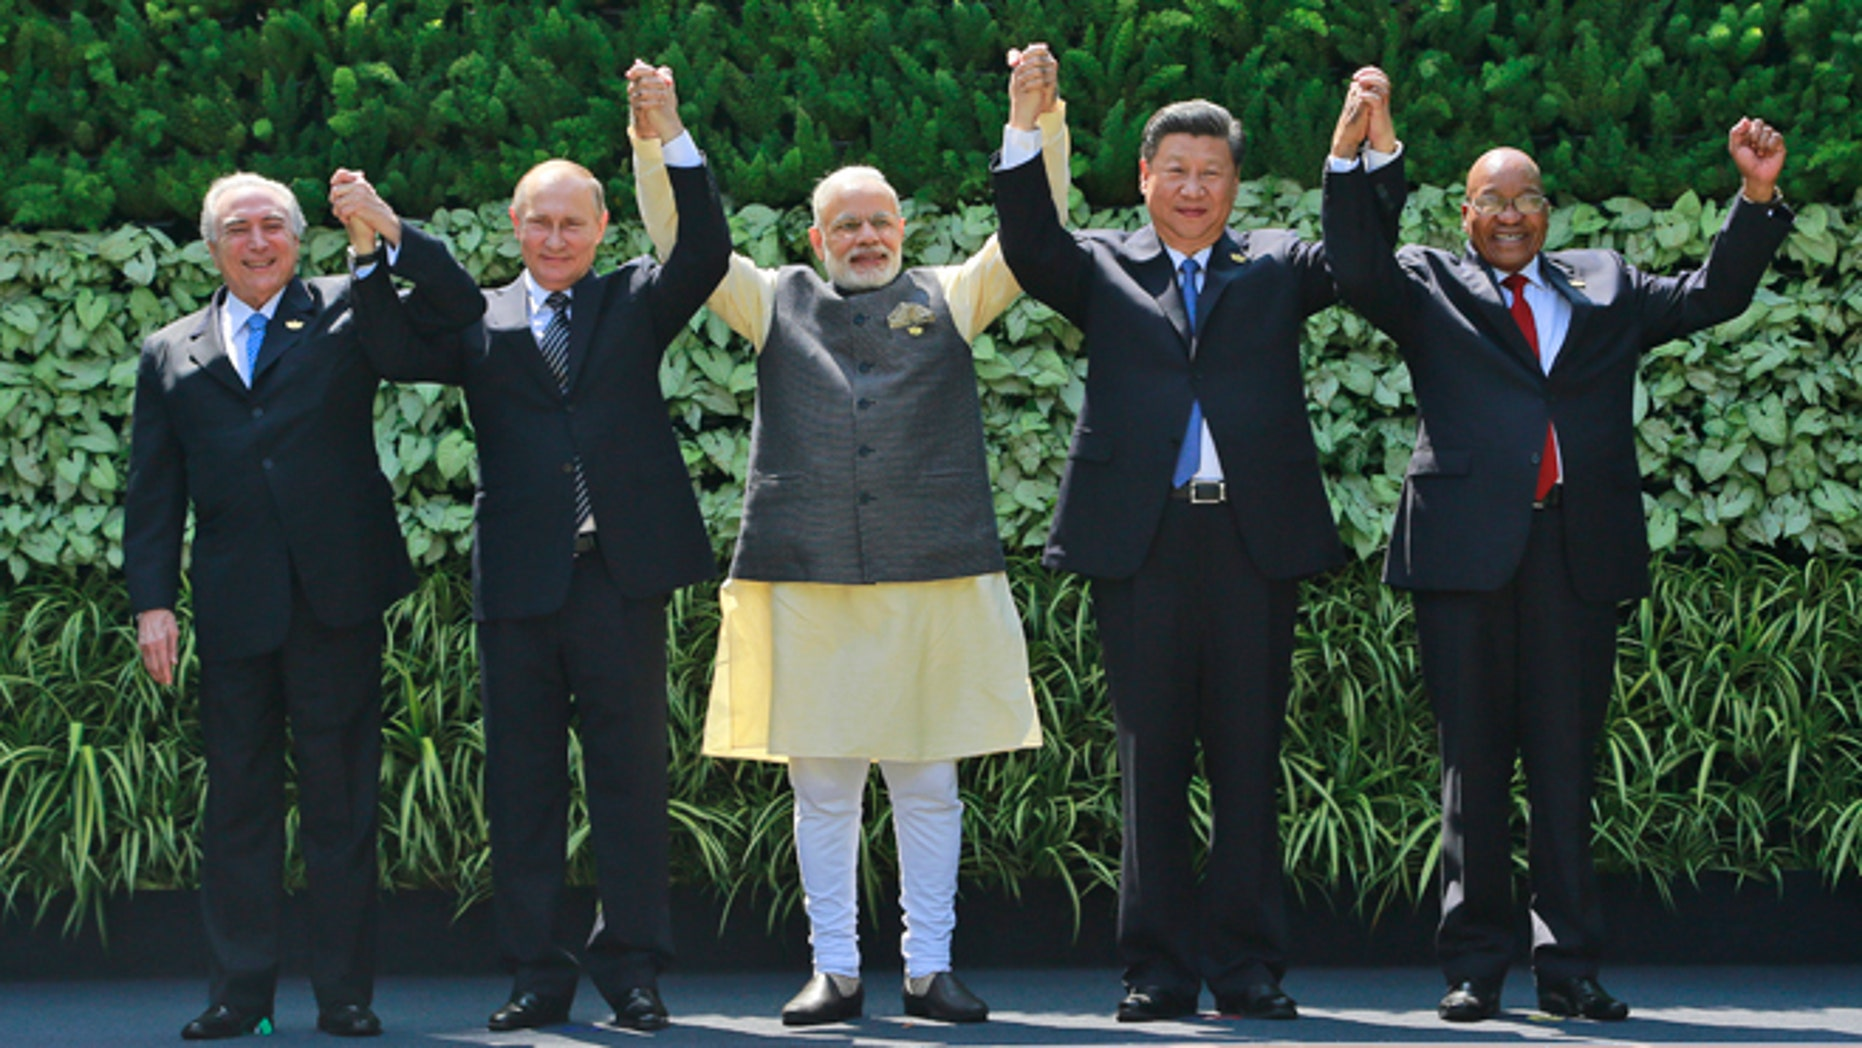 Brazilian President Michel Temer, Russian President Vladimir Putin, Indian Prime Minister Narendra Modi, Chinese President Xi Jinping, and South African President Jacob Zuma in Goa, India, Sunday, Oct. 16, 2016.